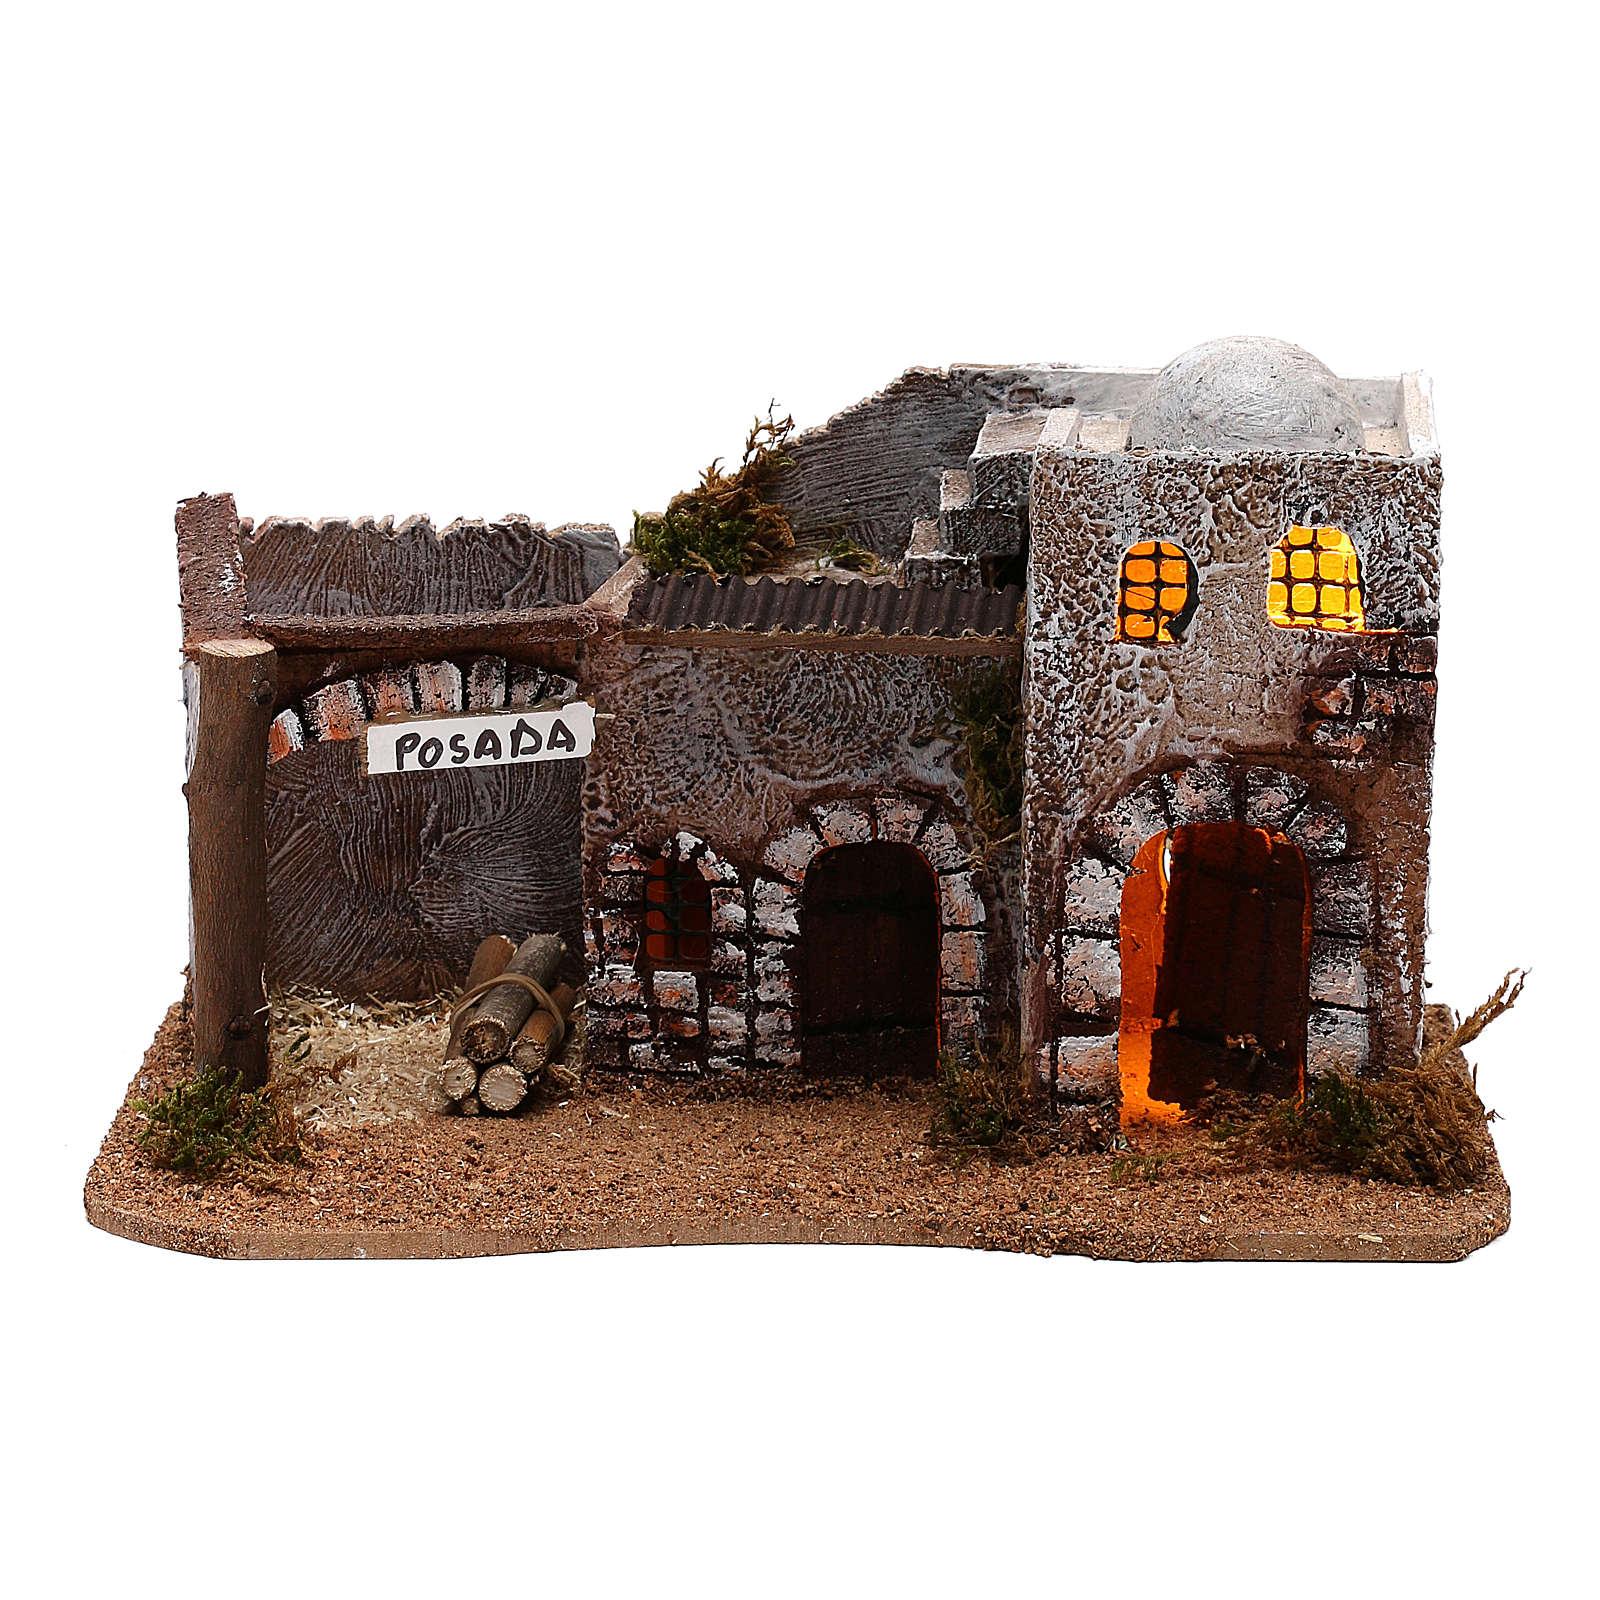 Inn for Arabic style Nativity scene with lights 15x30x15 cm 4